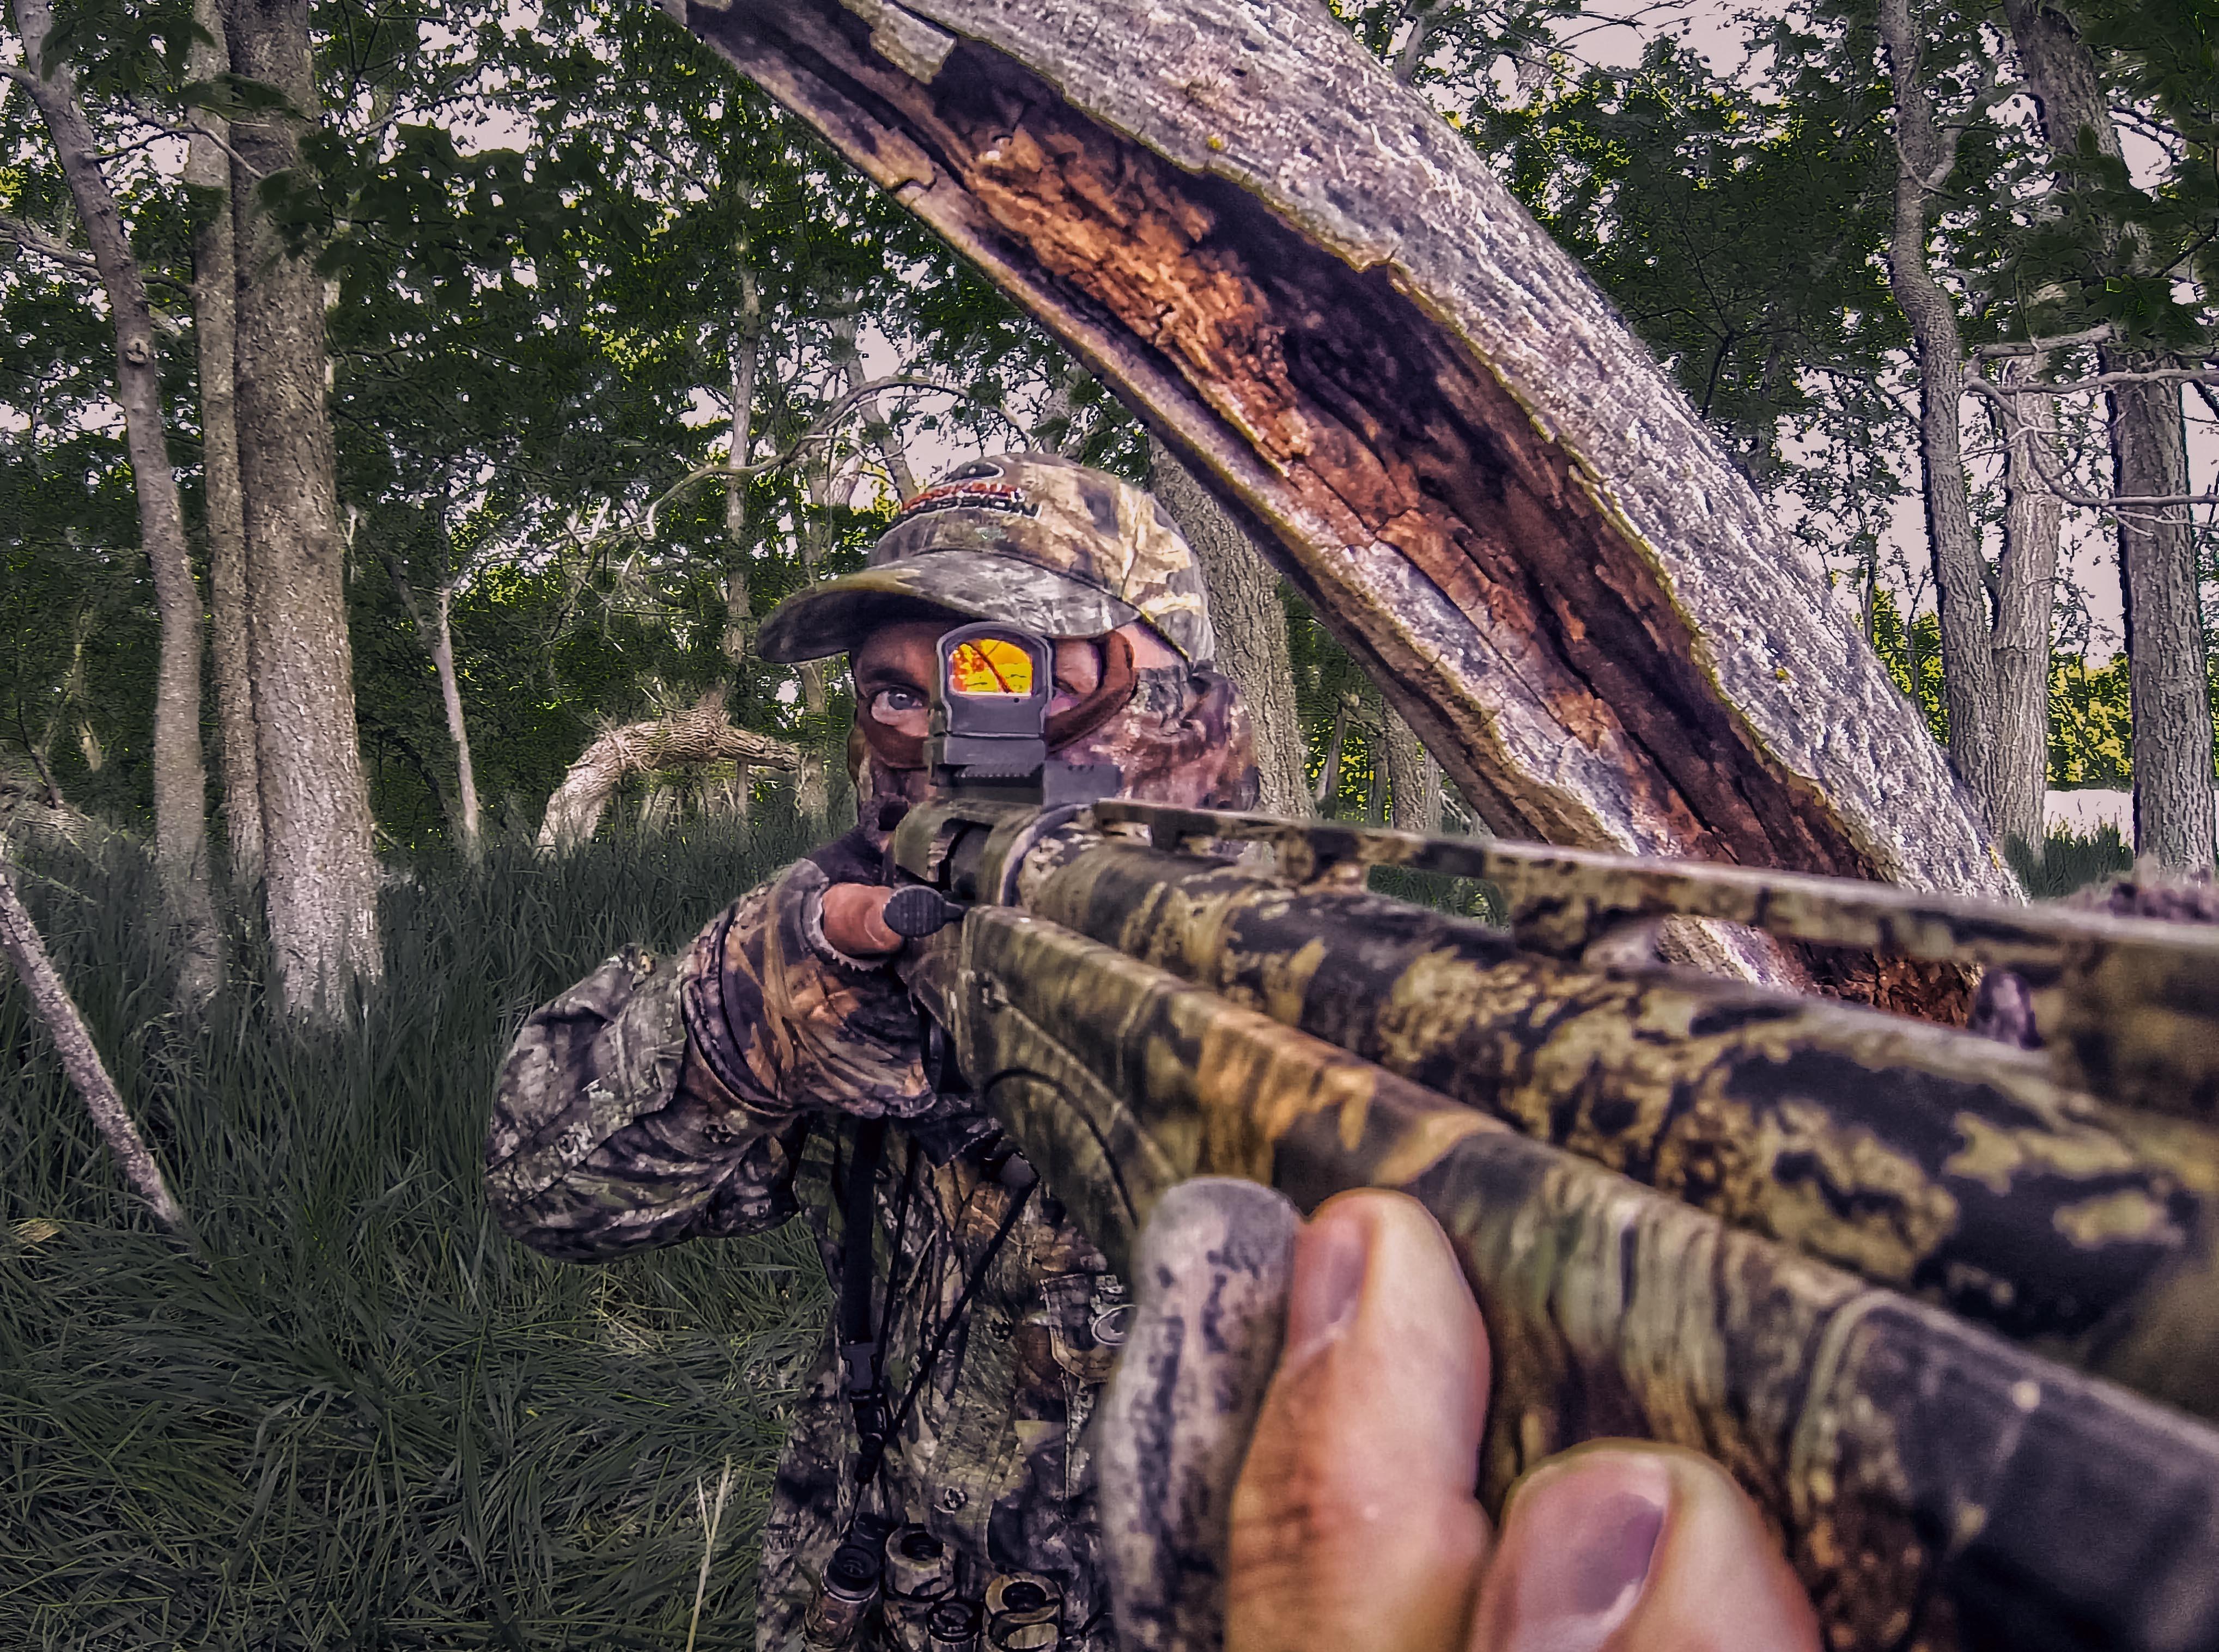 Turkey Hunting Go Pro